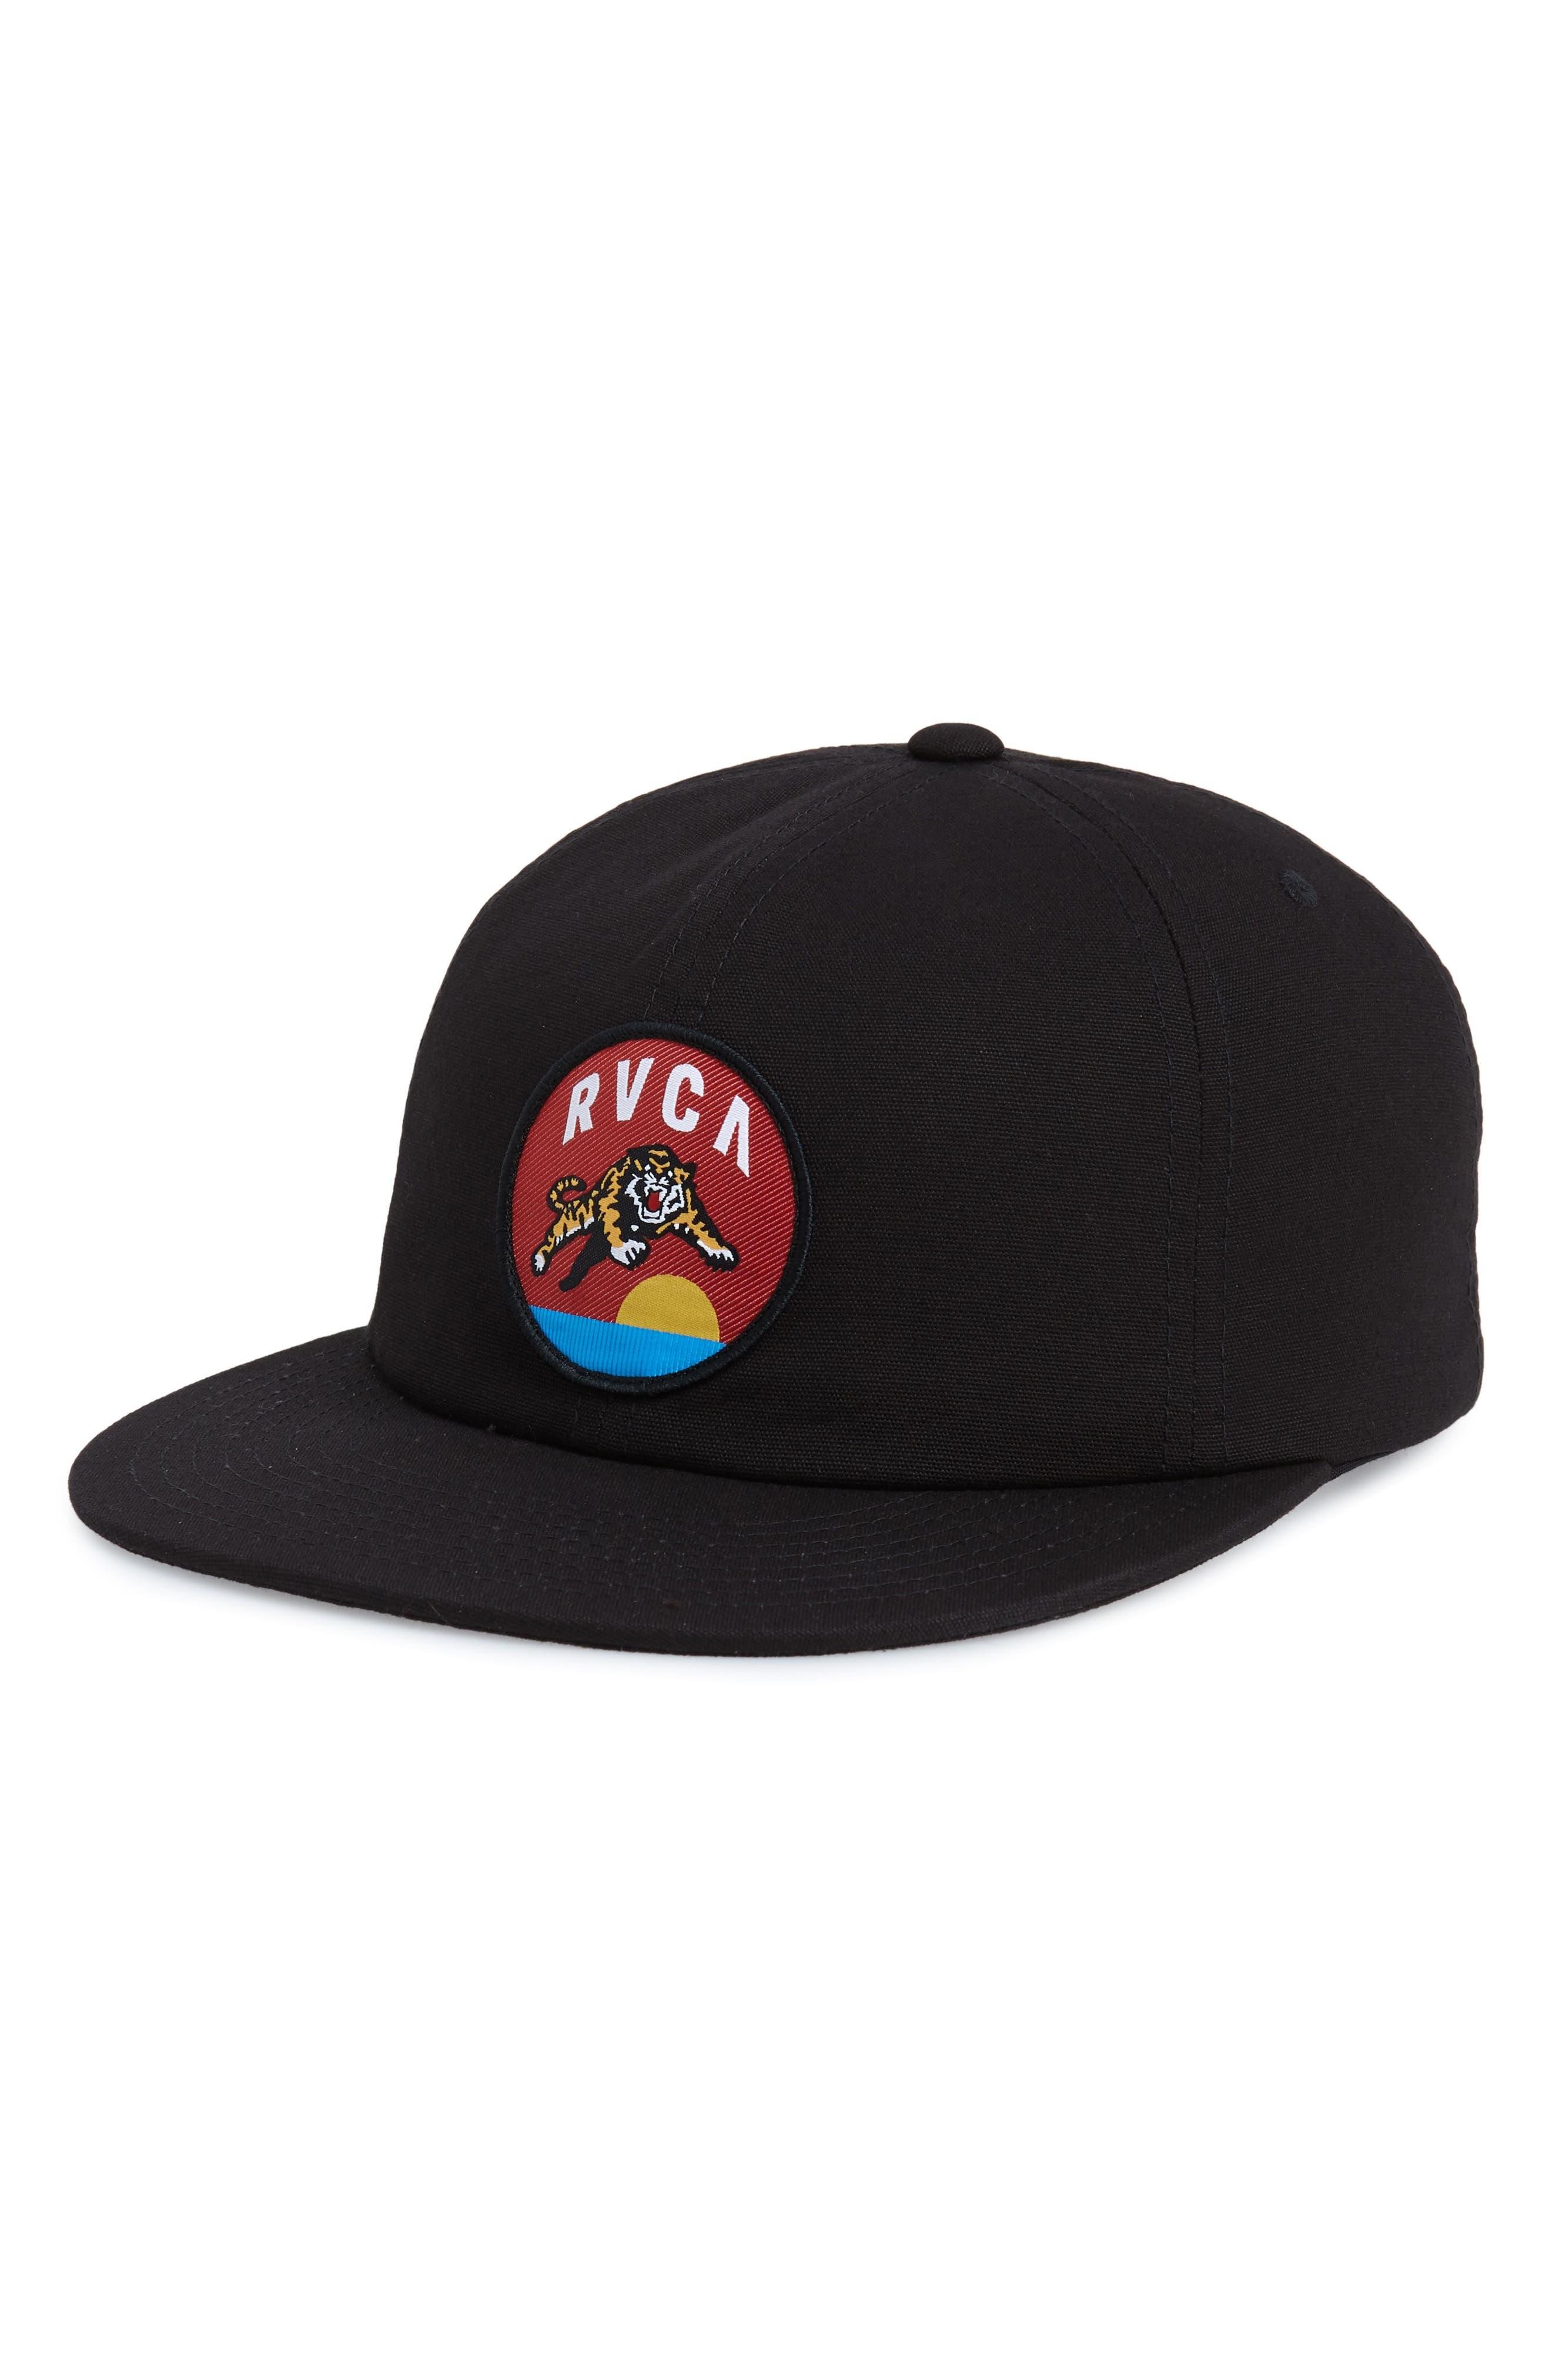 RVCA, Prowler Snapback Baseball Cap, Main thumbnail 1, color, BLACK